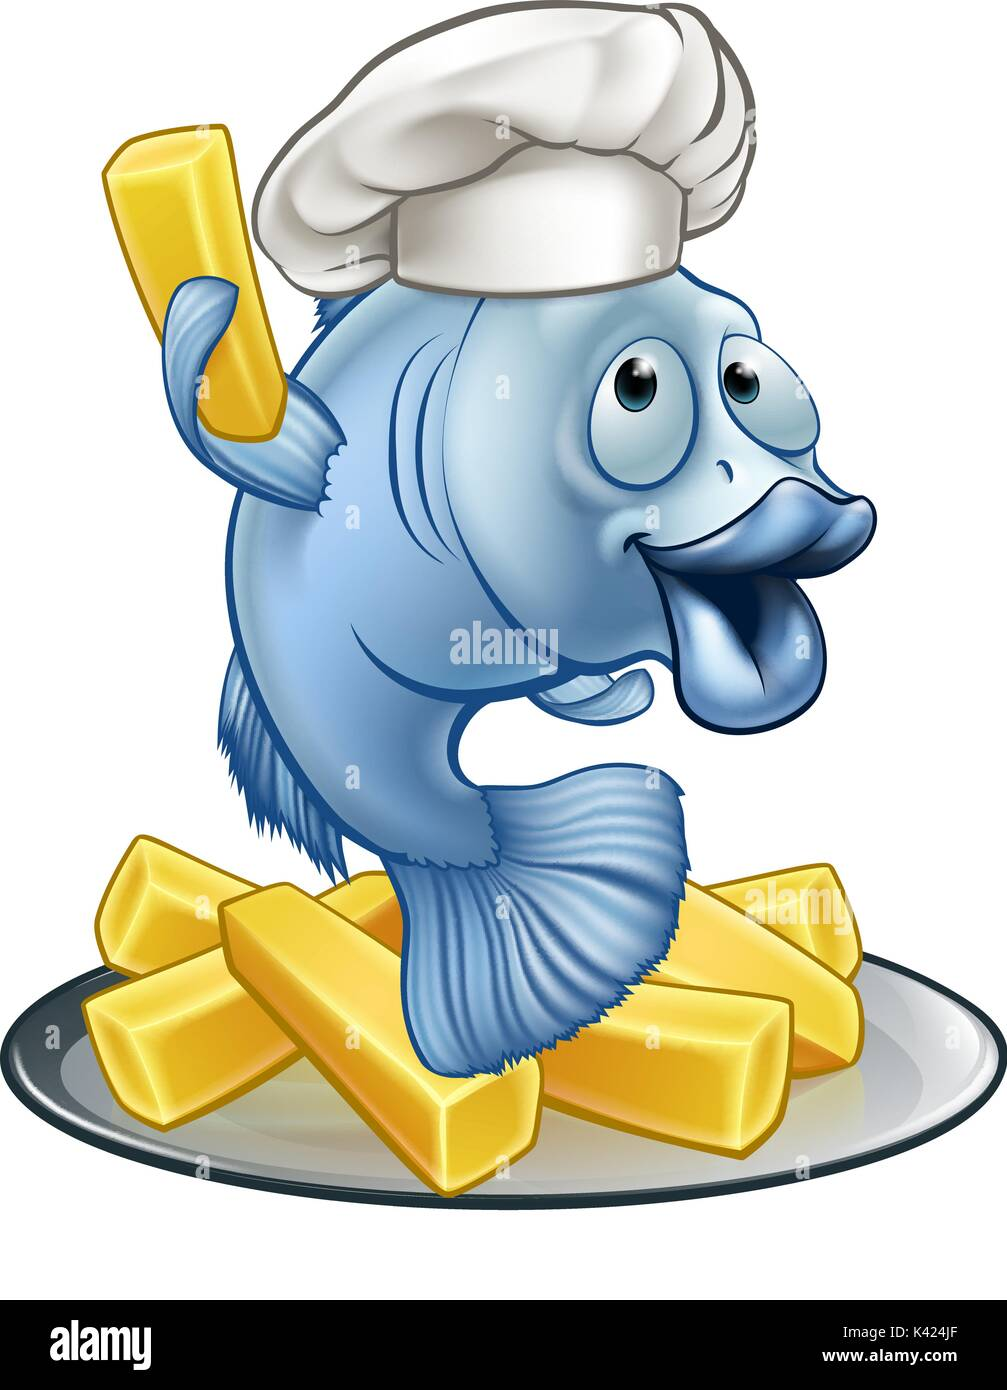 Fish N Chips Cartoon Characters : Fish and chips chef cartoon character stock vector art